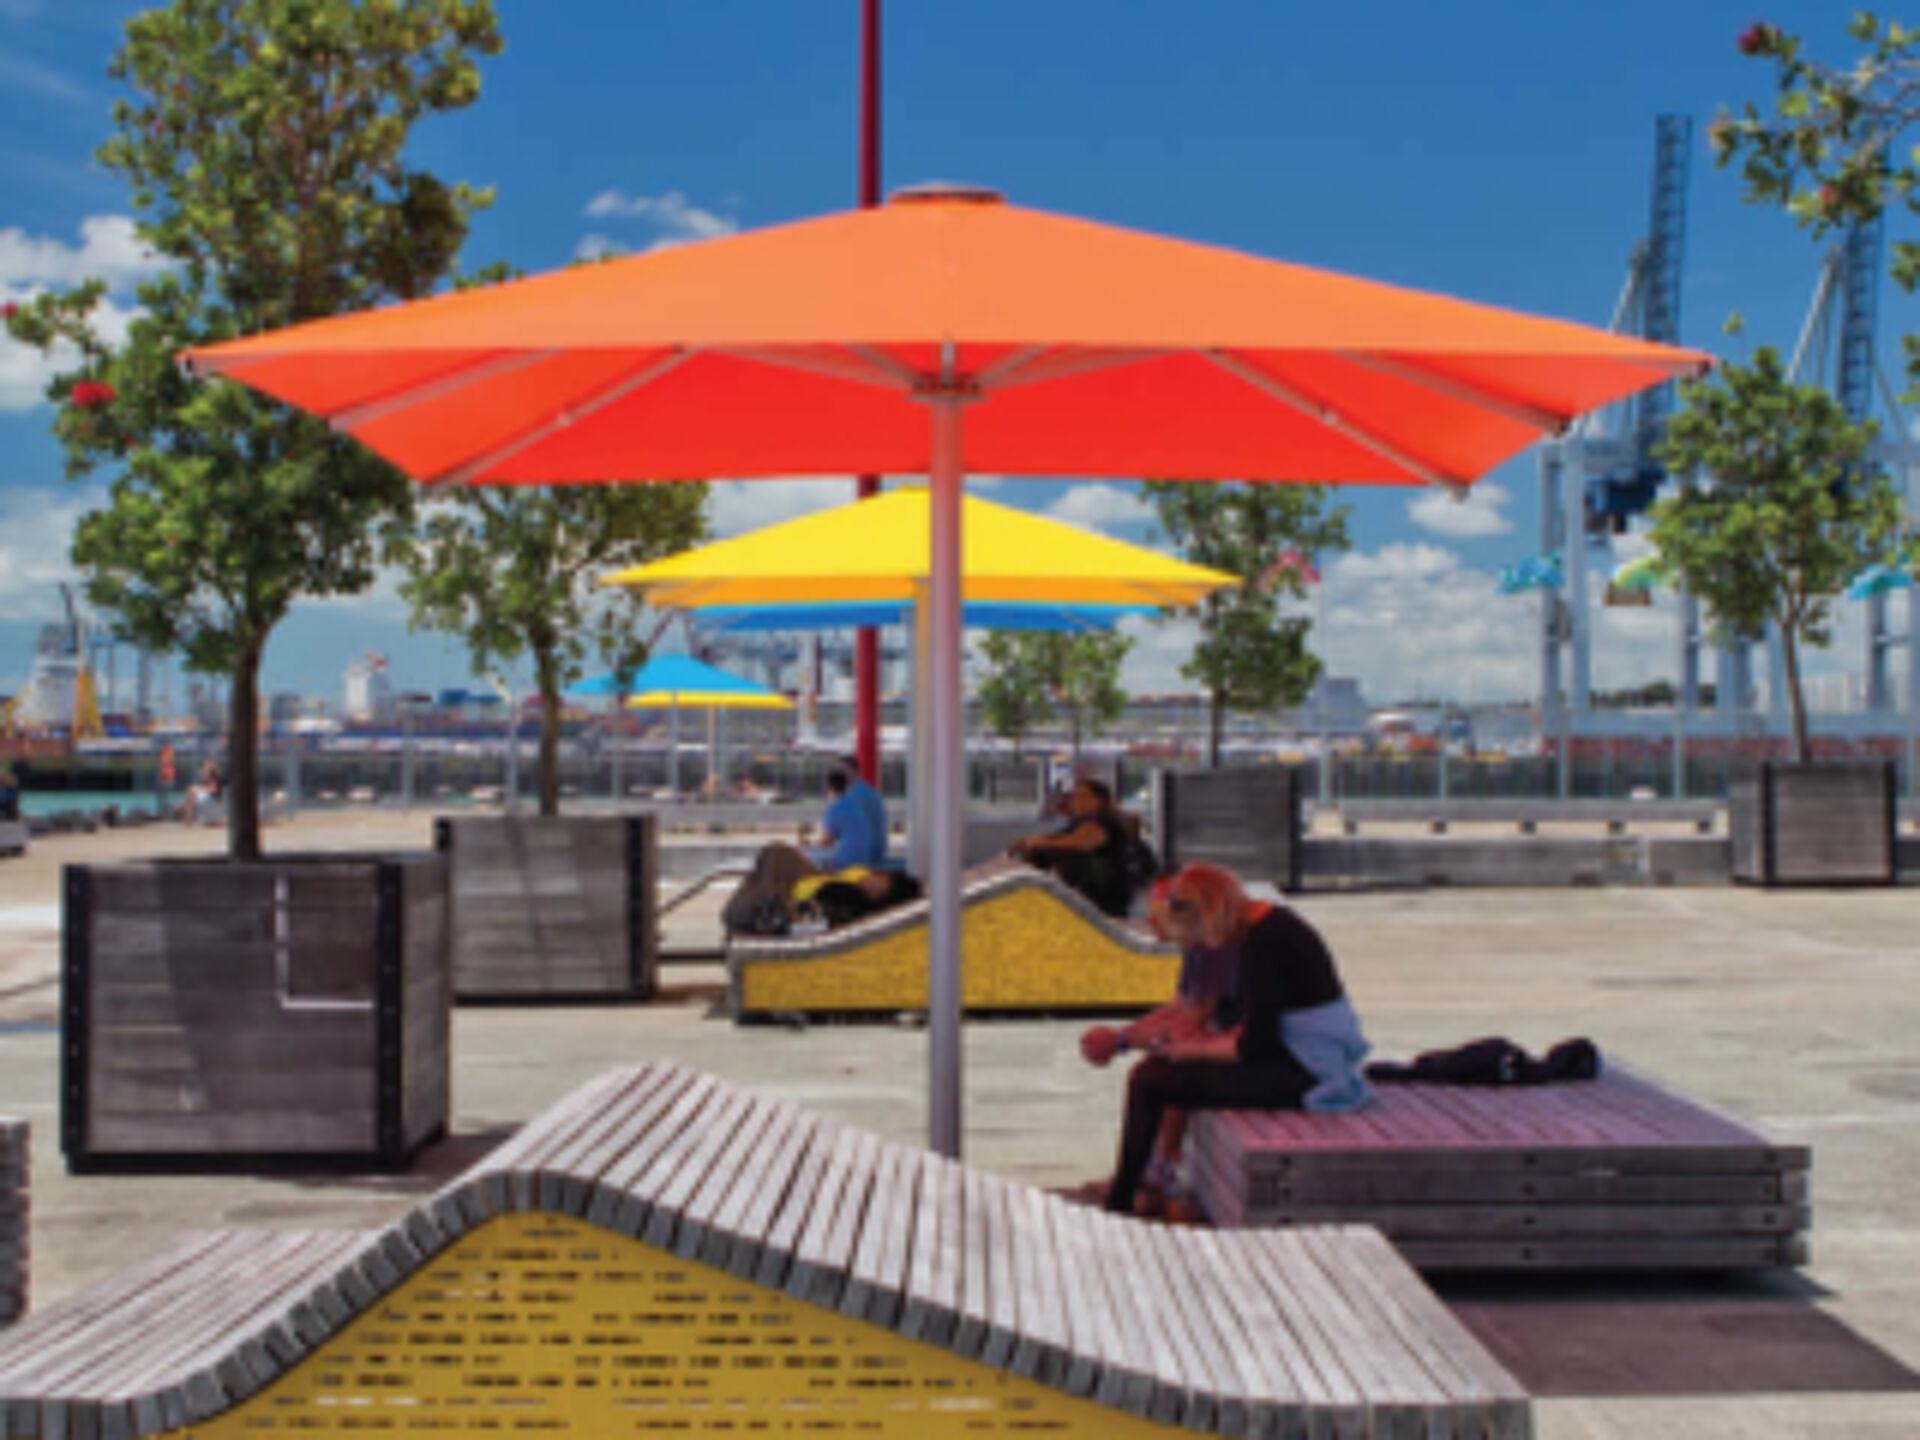 Square Commercial Outdoor Umbrellas NZ